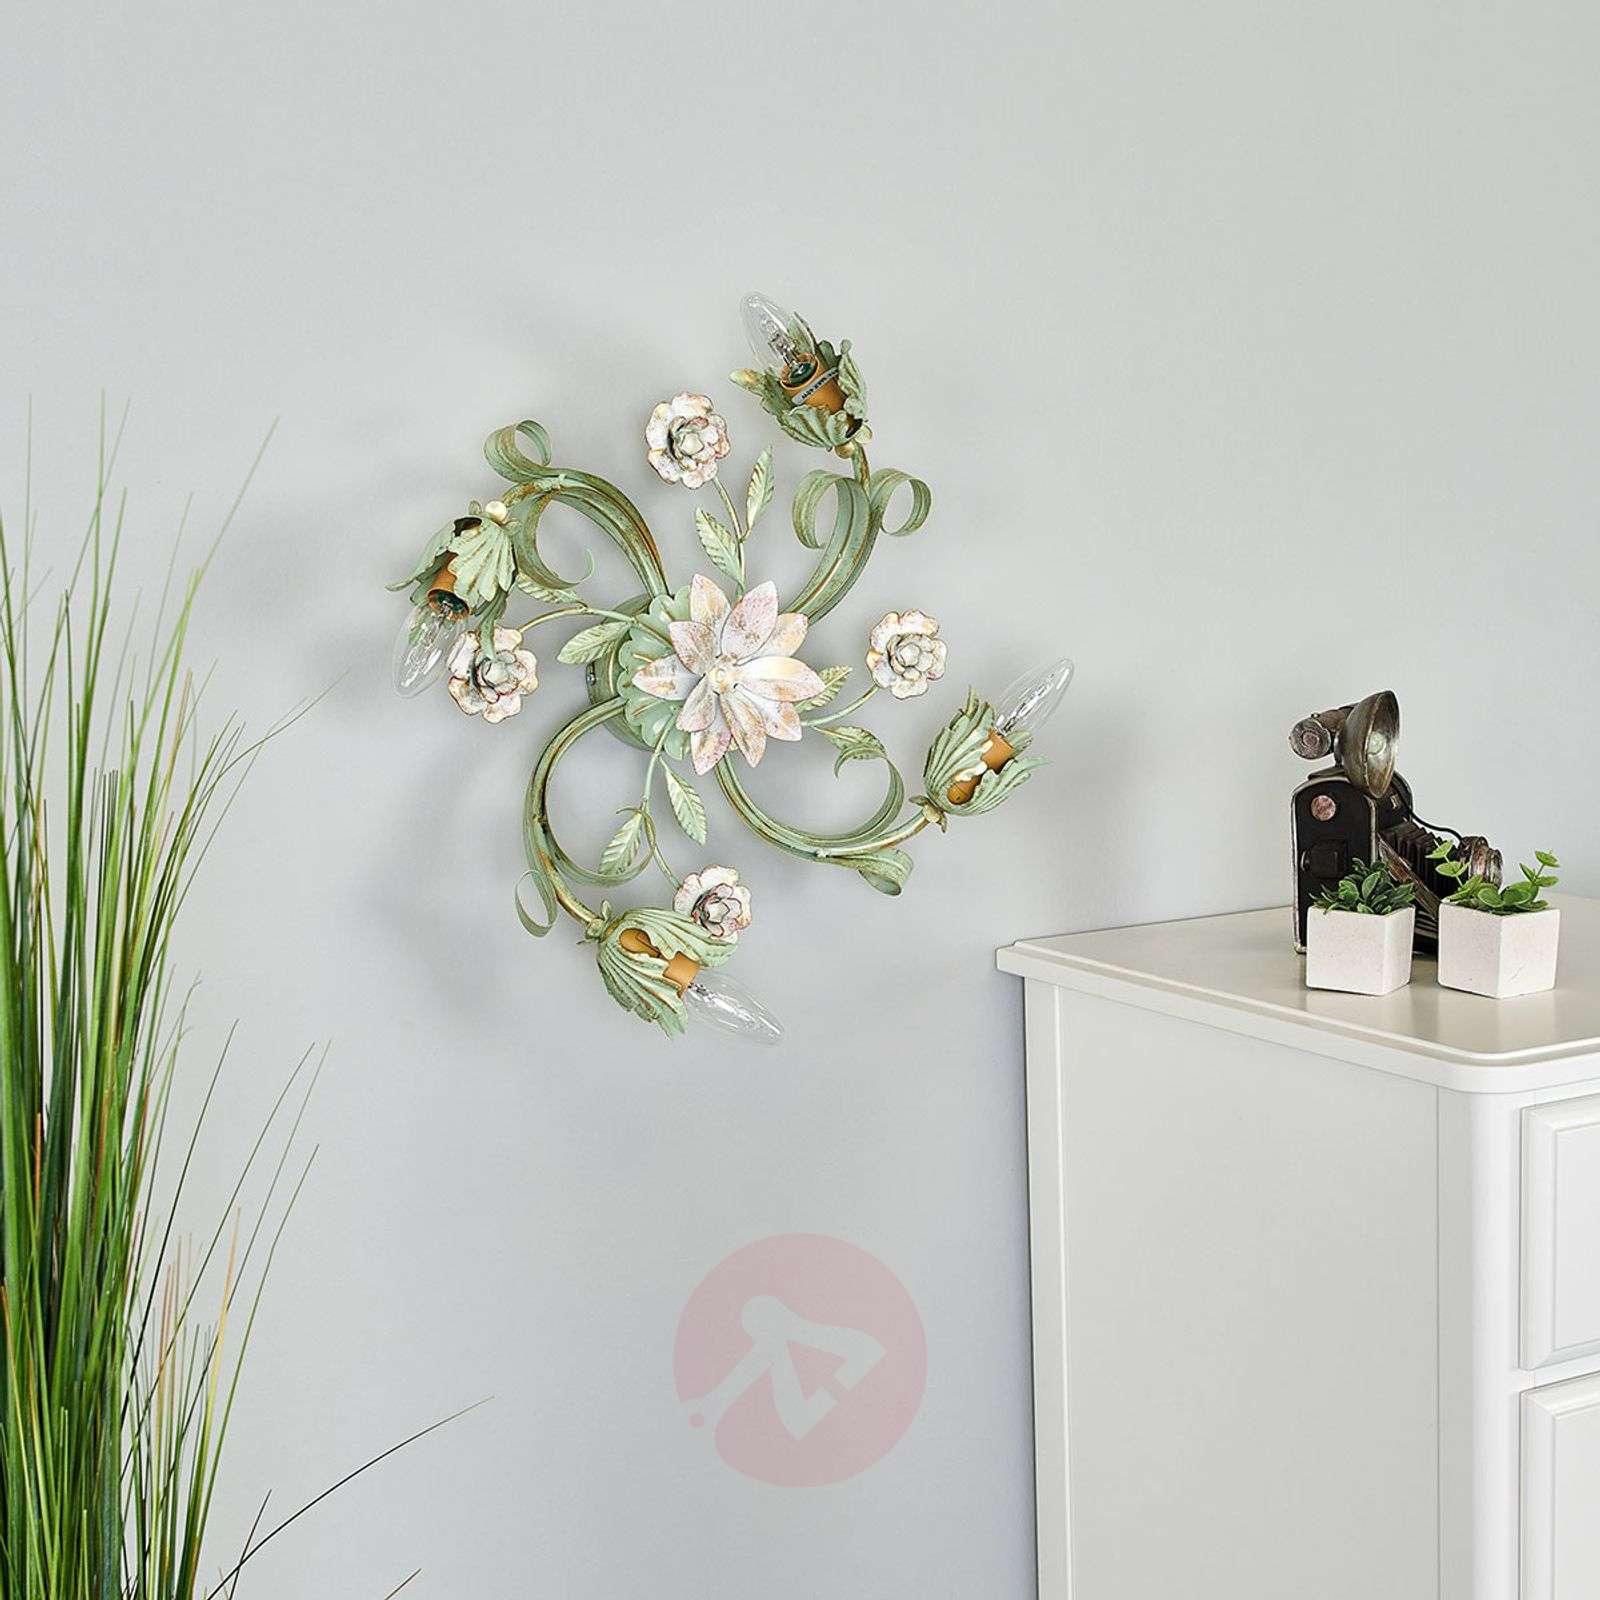 Tulipe ceiling lamp designed in a Florentine style-3532167-02